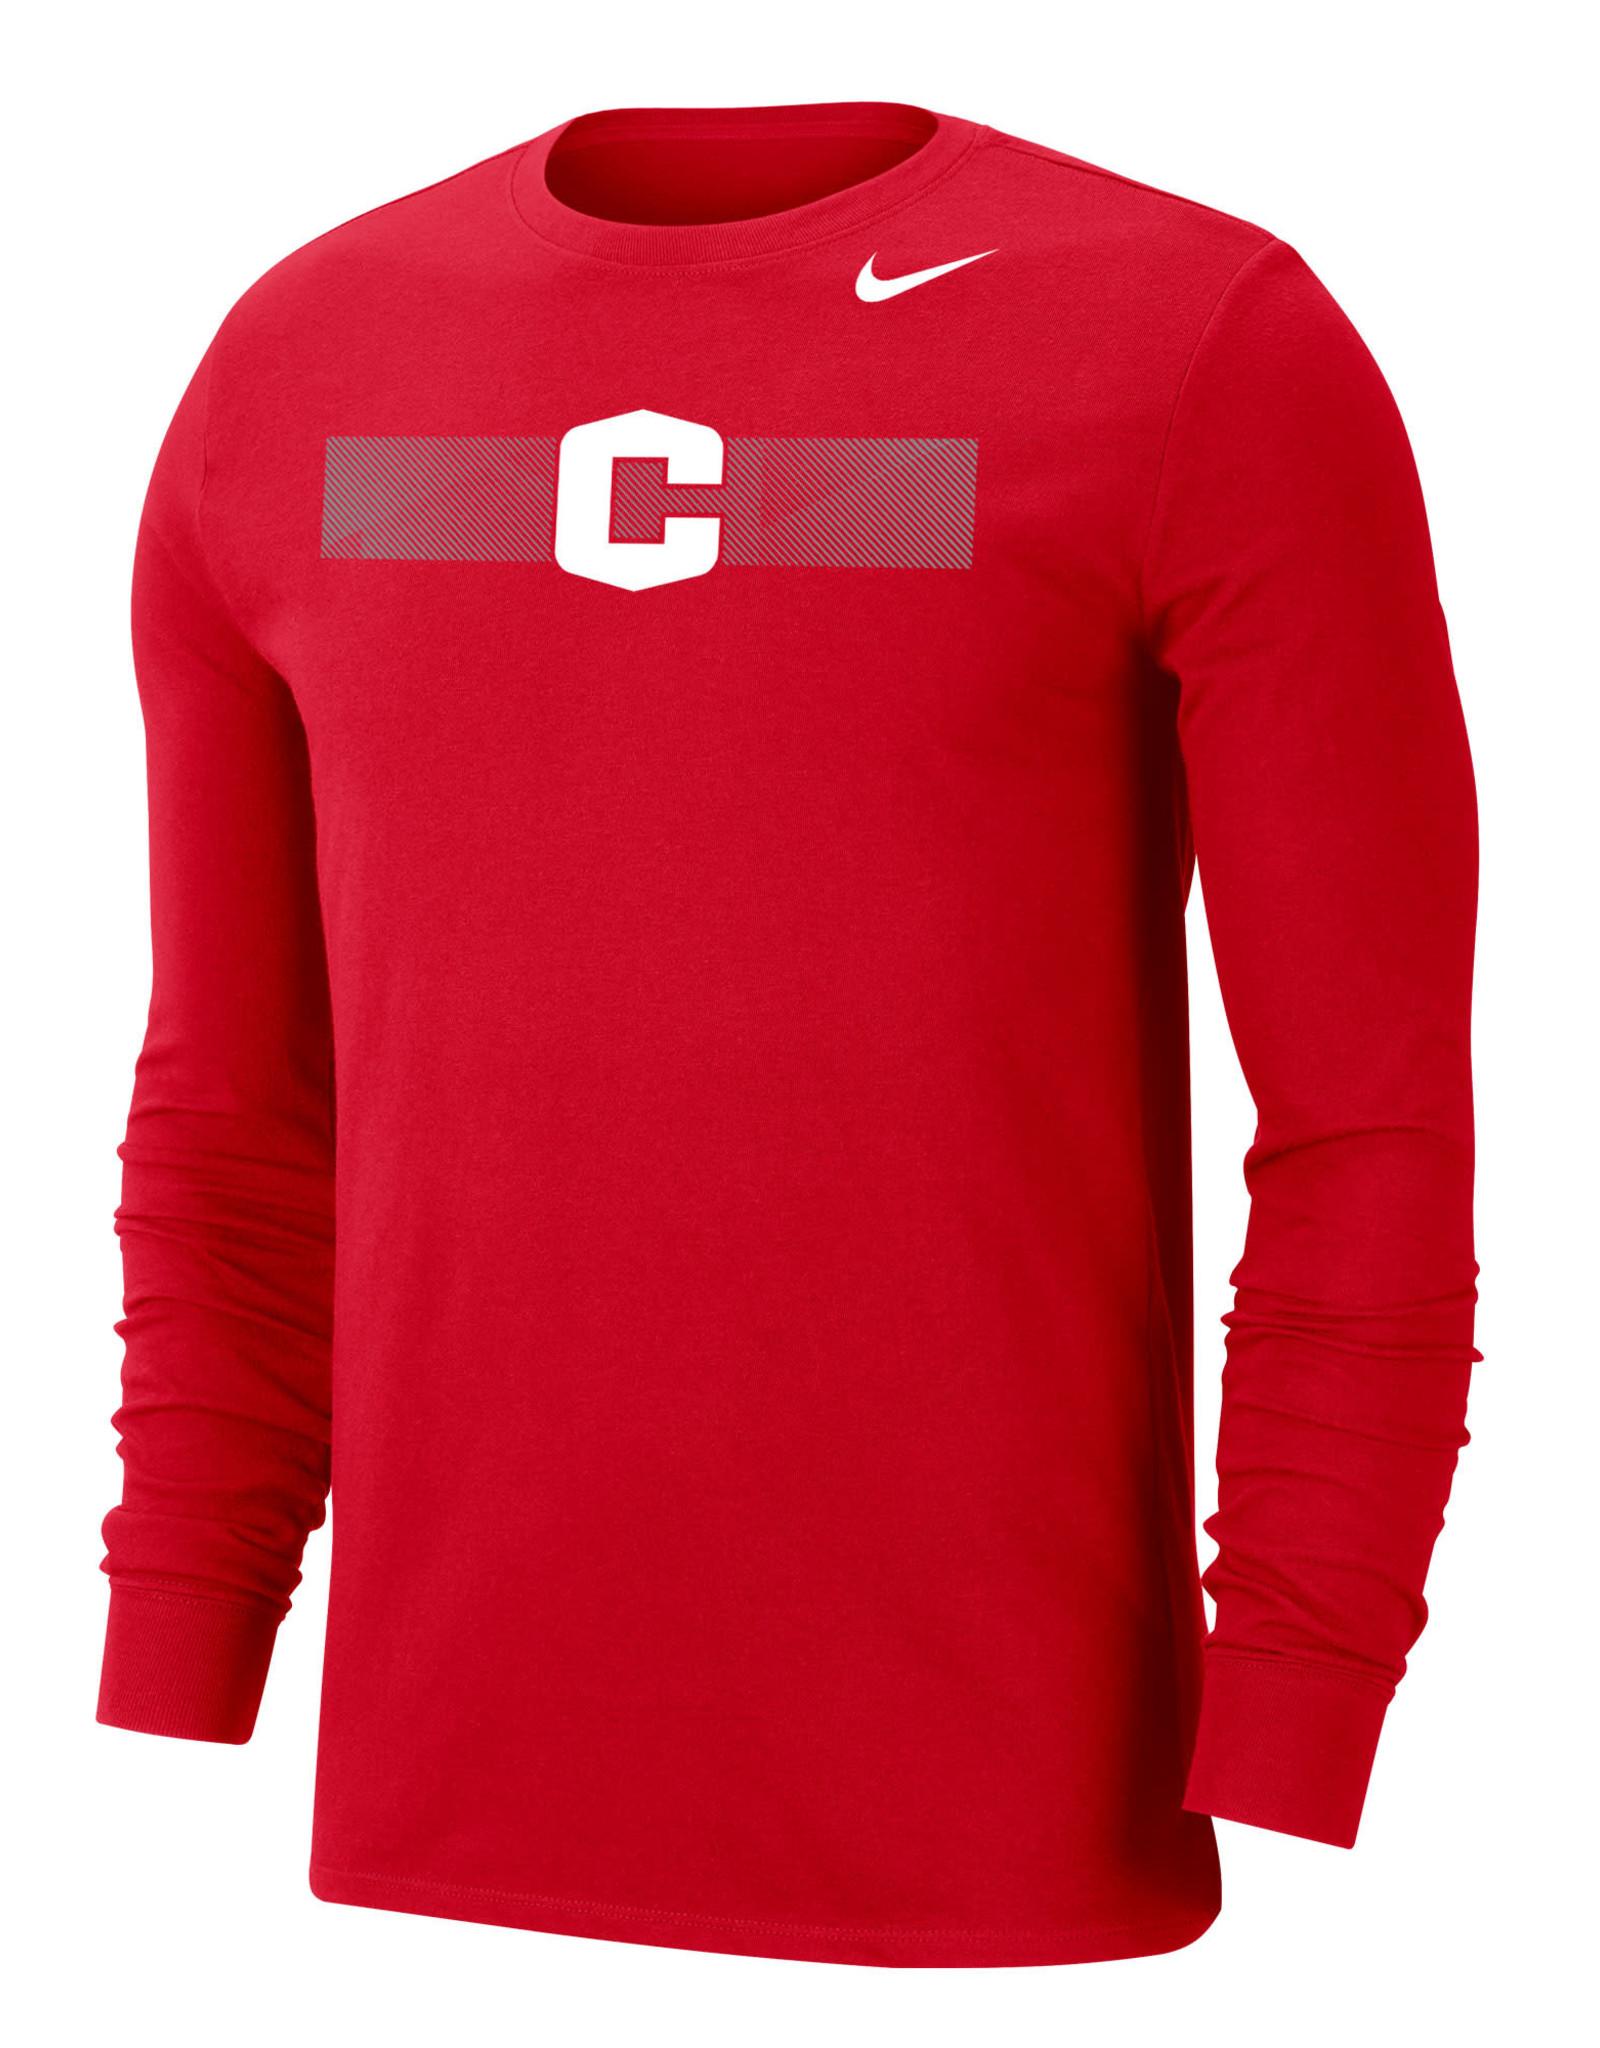 Nike Nike Dri-Fit LS Tee Red